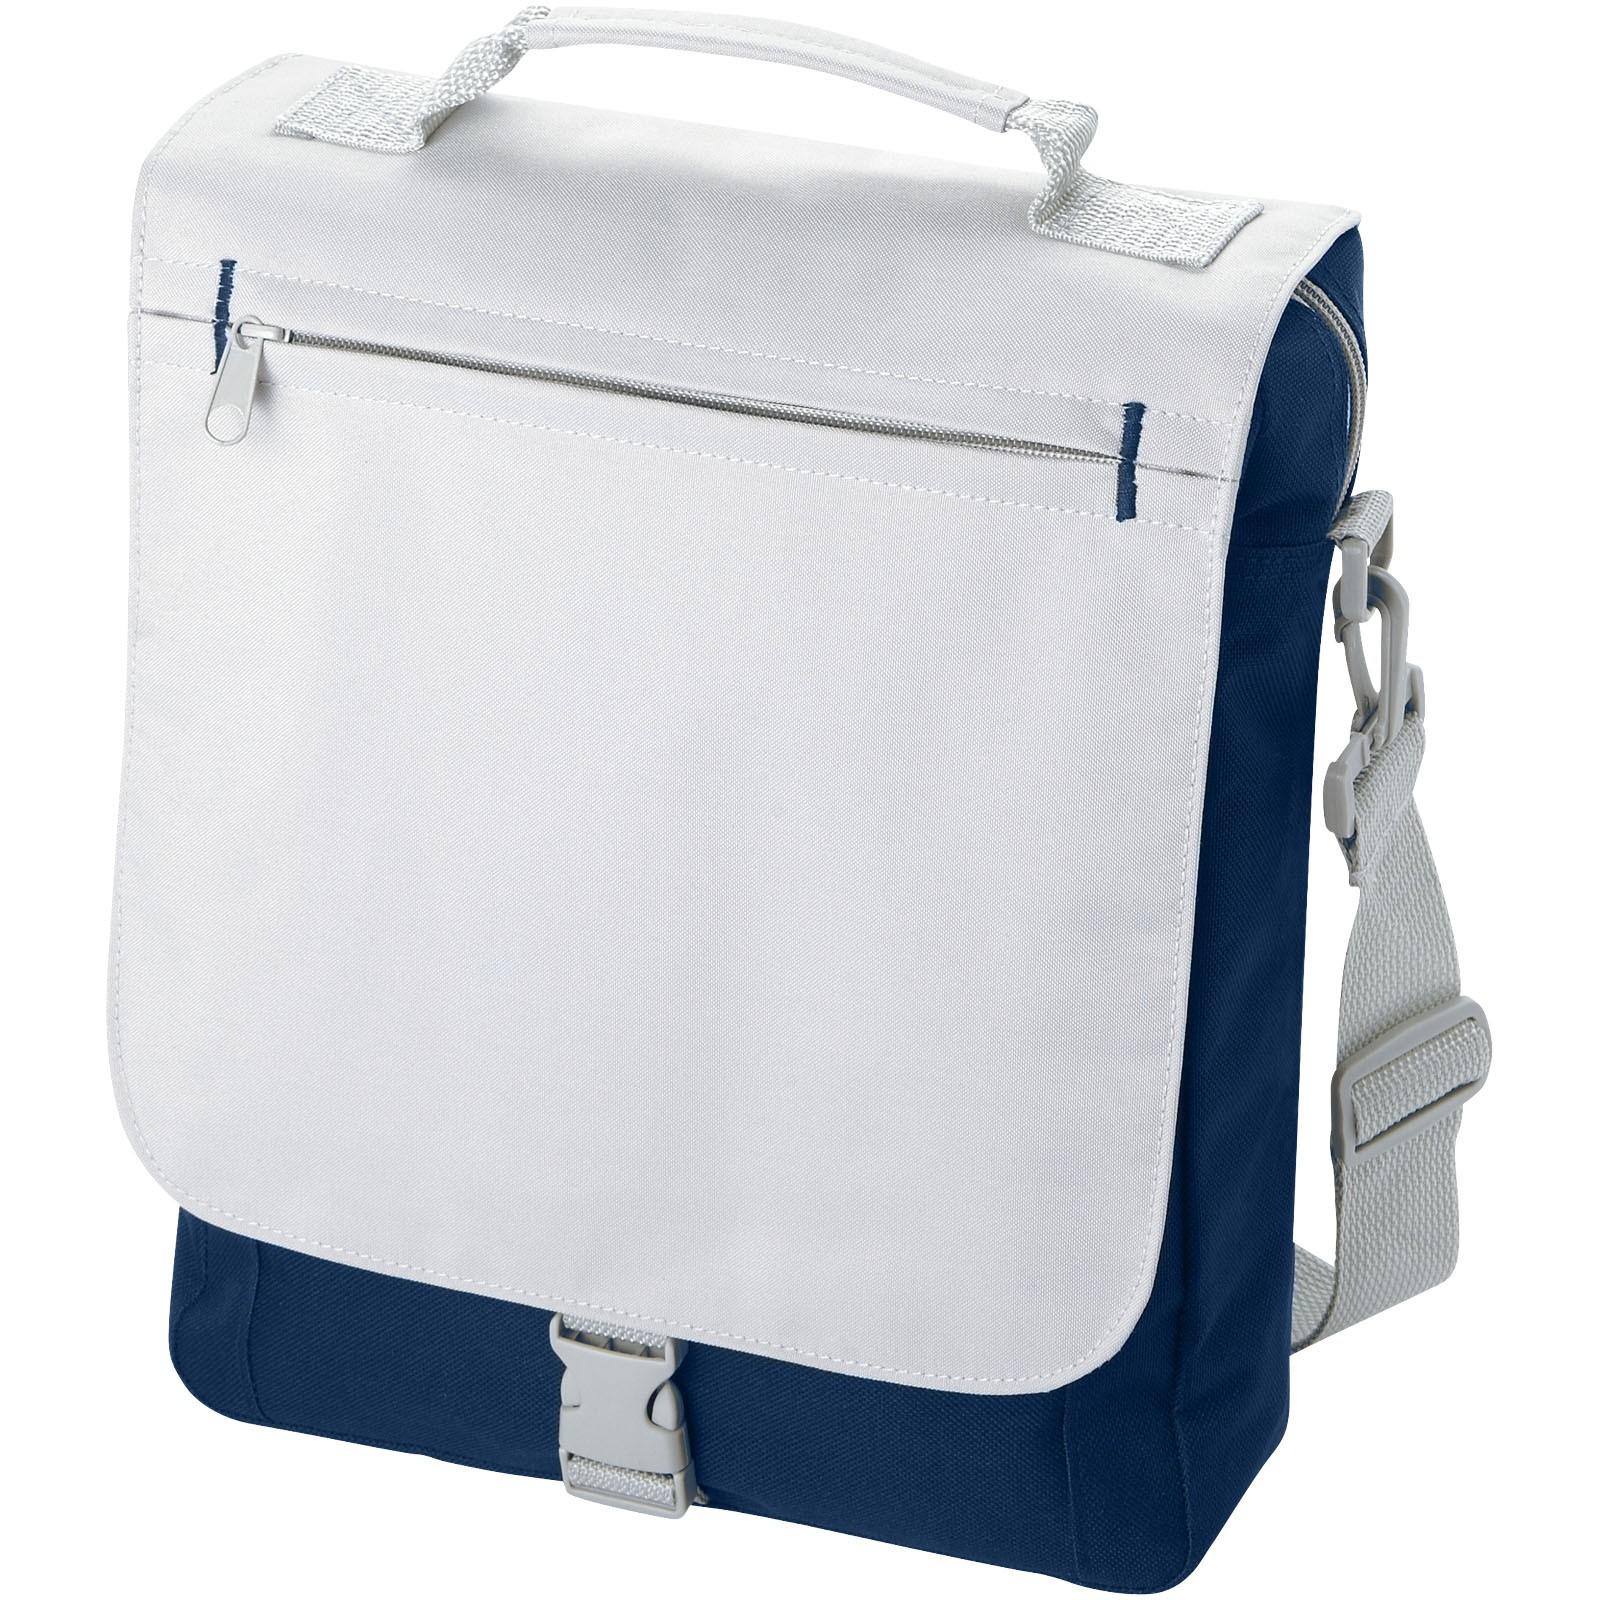 Philadelphia conference bag - Navy / Light grey